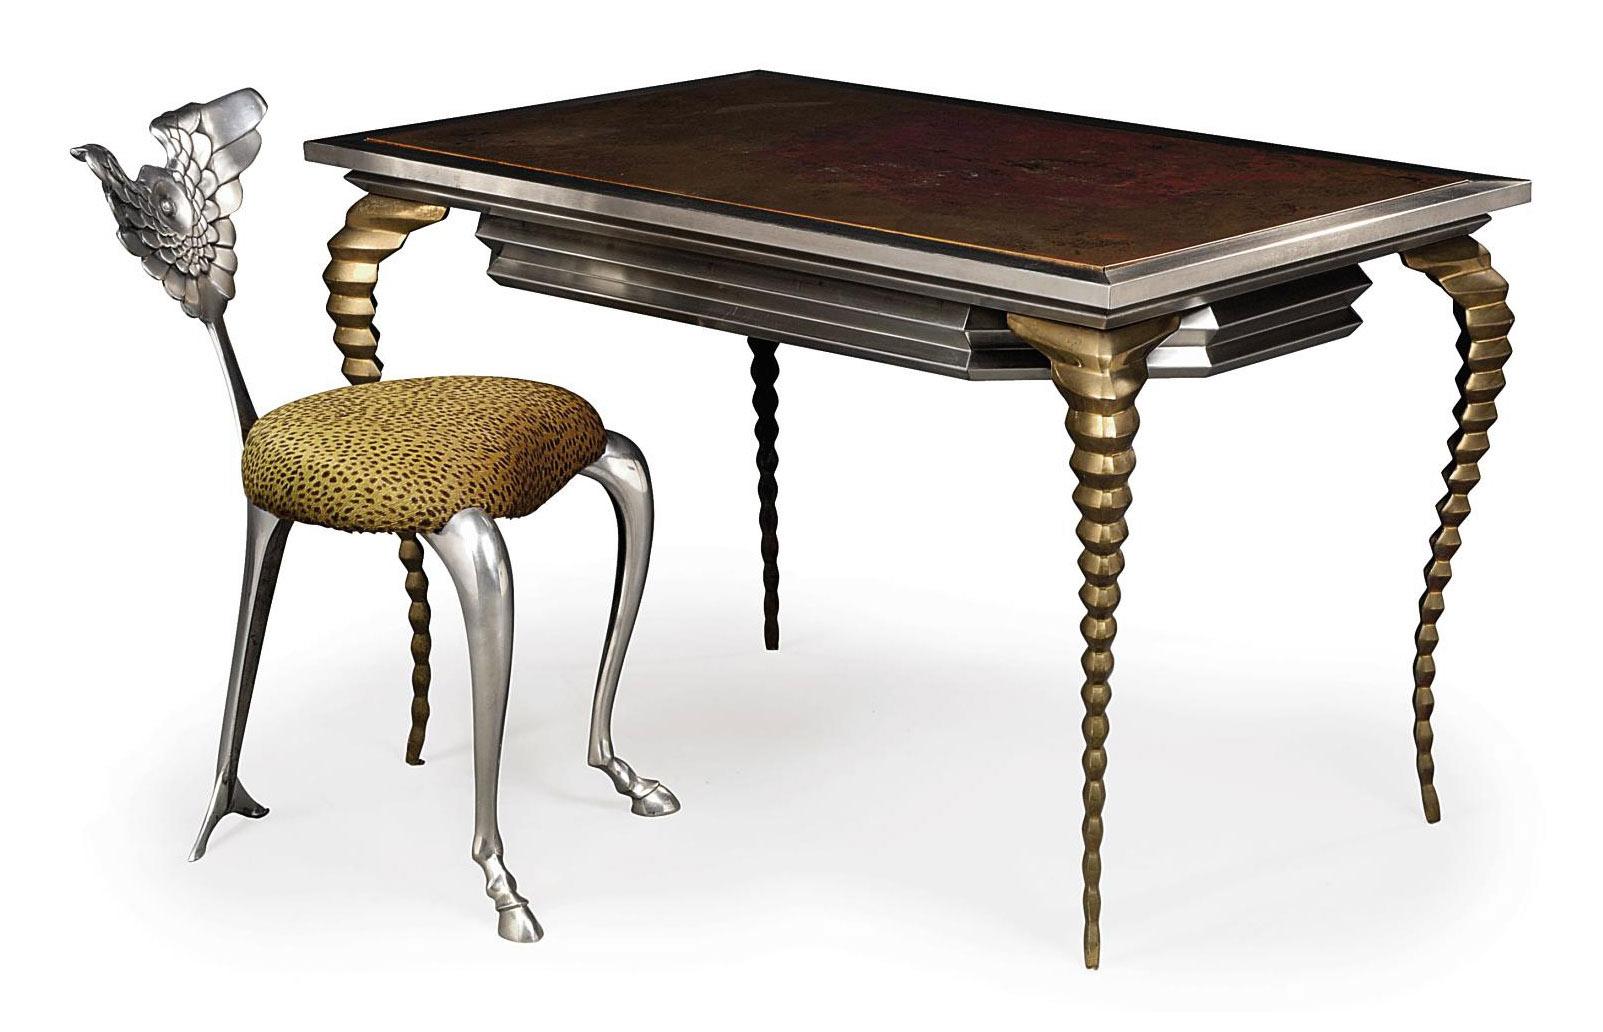 Astounding A Mark Brazier Jones Alligator Desk And Pegasus Chair Andrewgaddart Wooden Chair Designs For Living Room Andrewgaddartcom